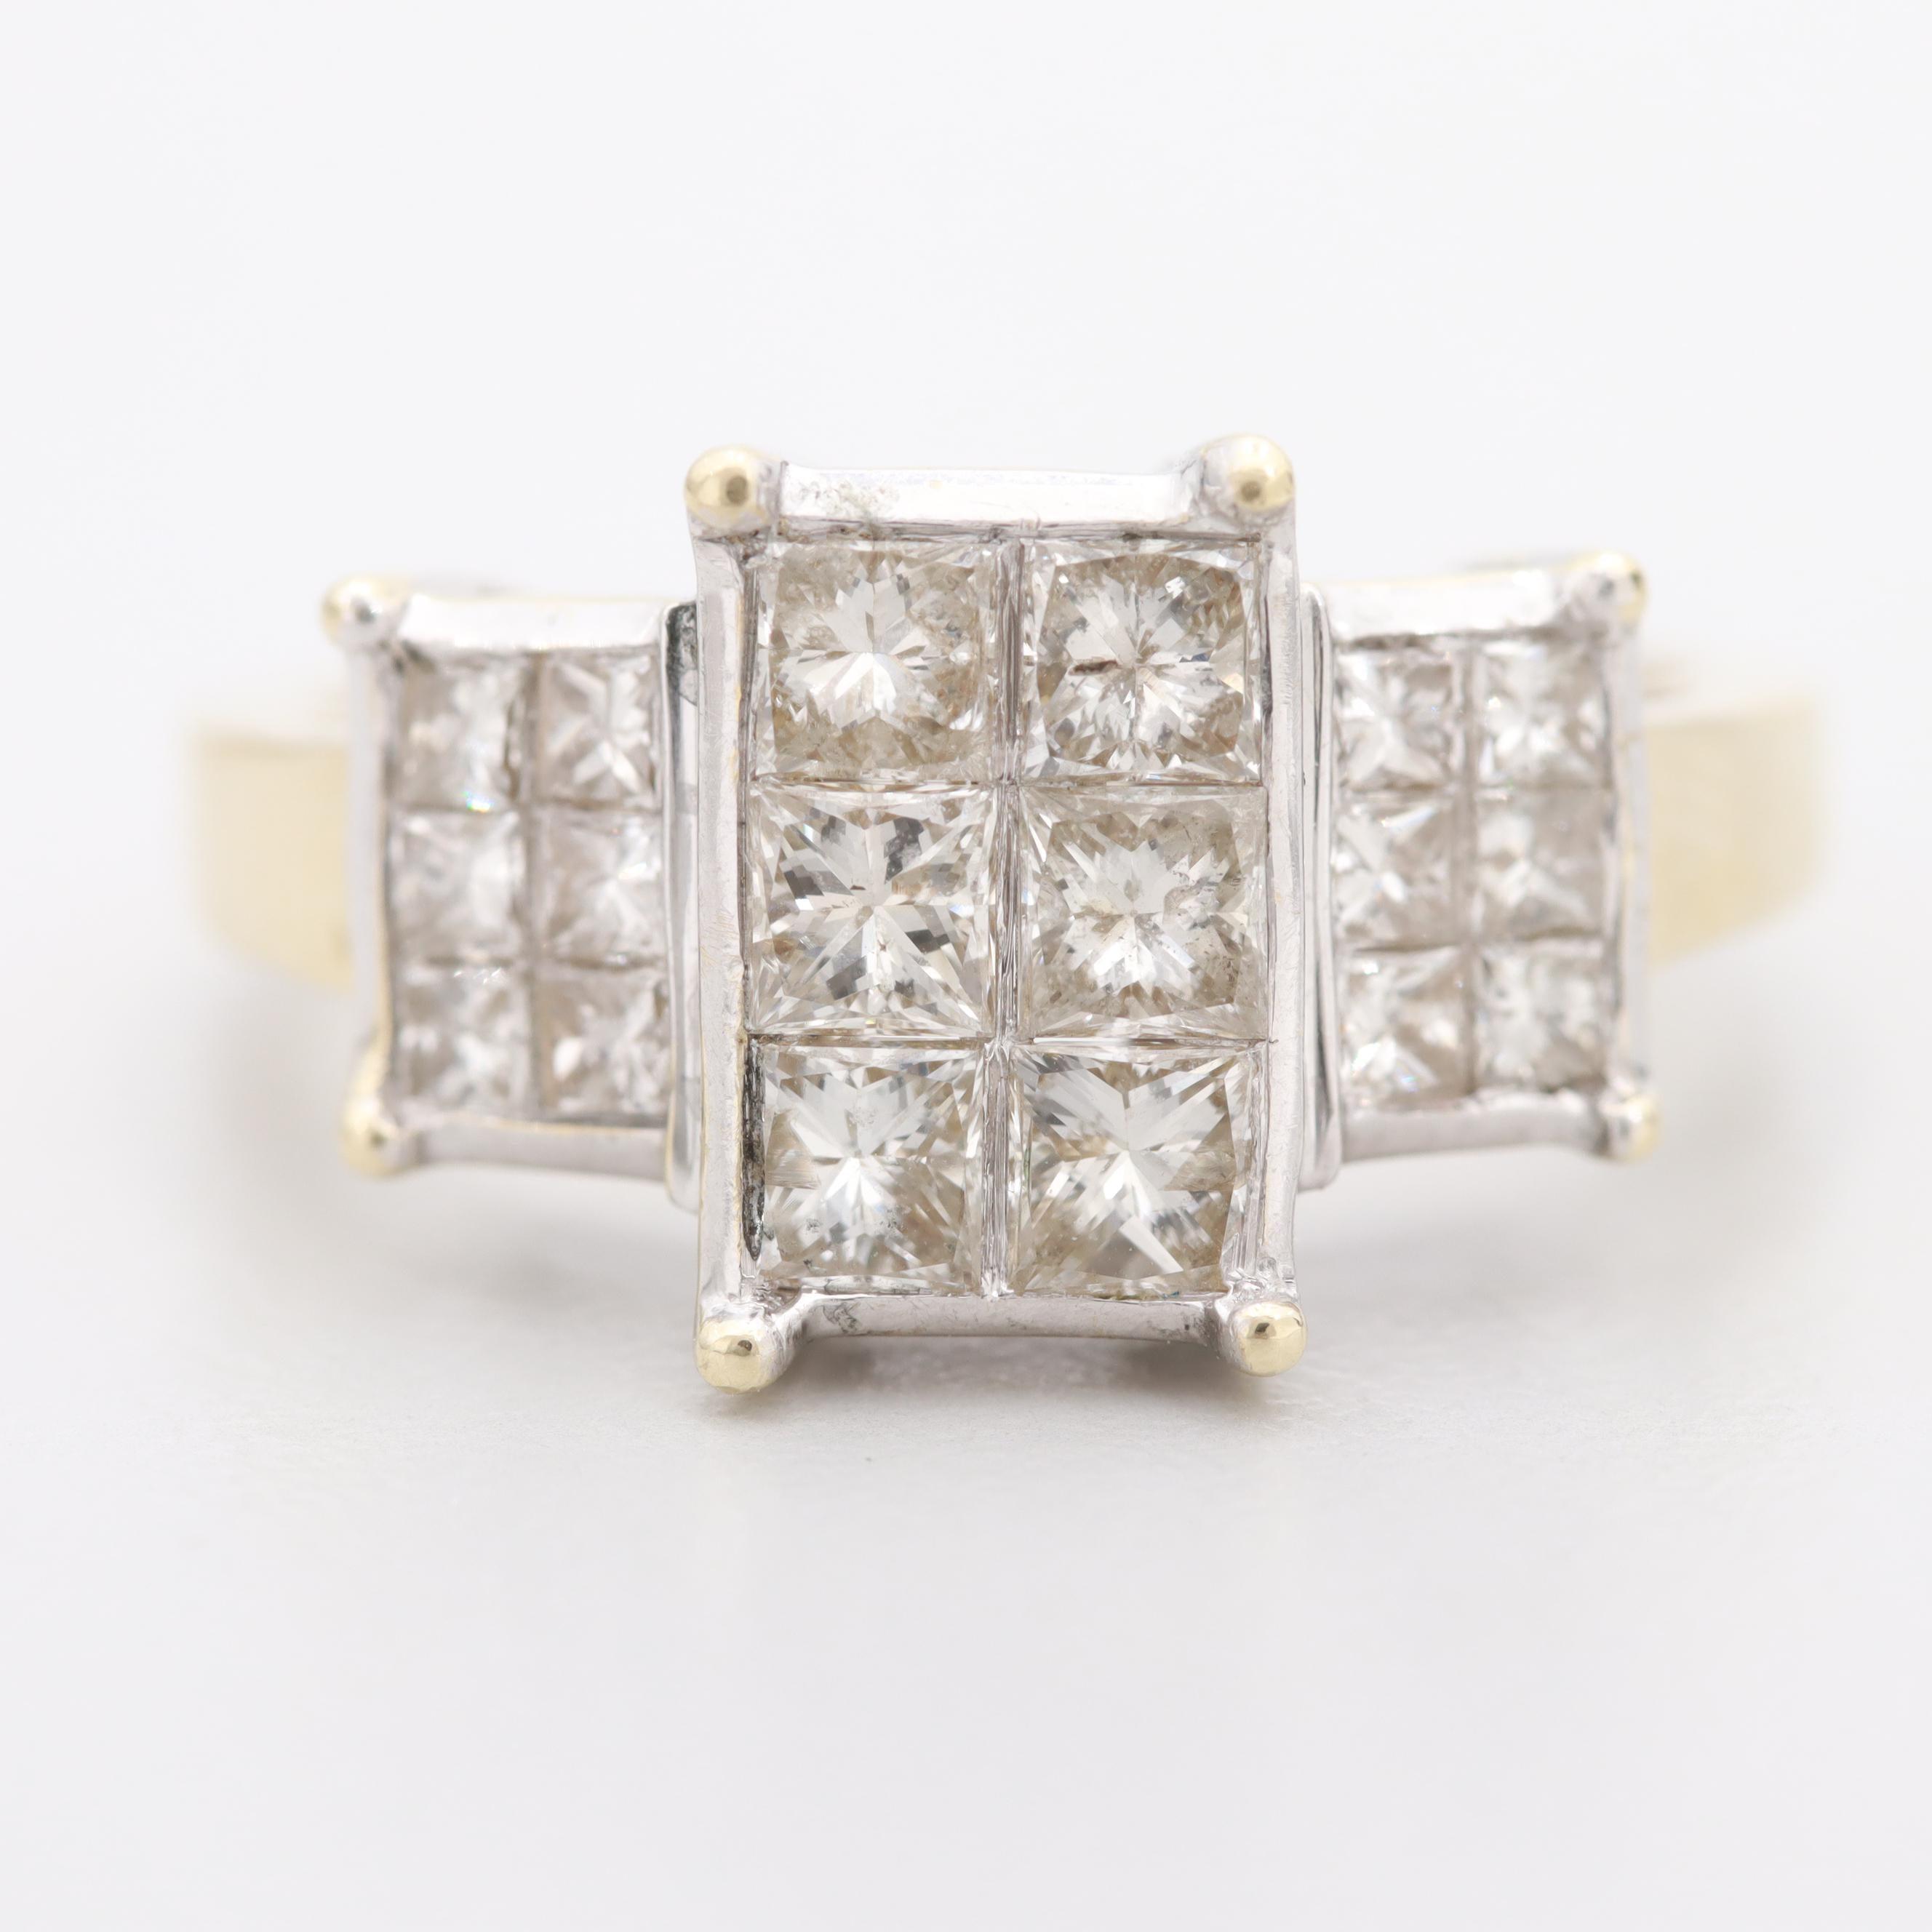 14K Yellow Gold 1.38 CTW Diamond Ring